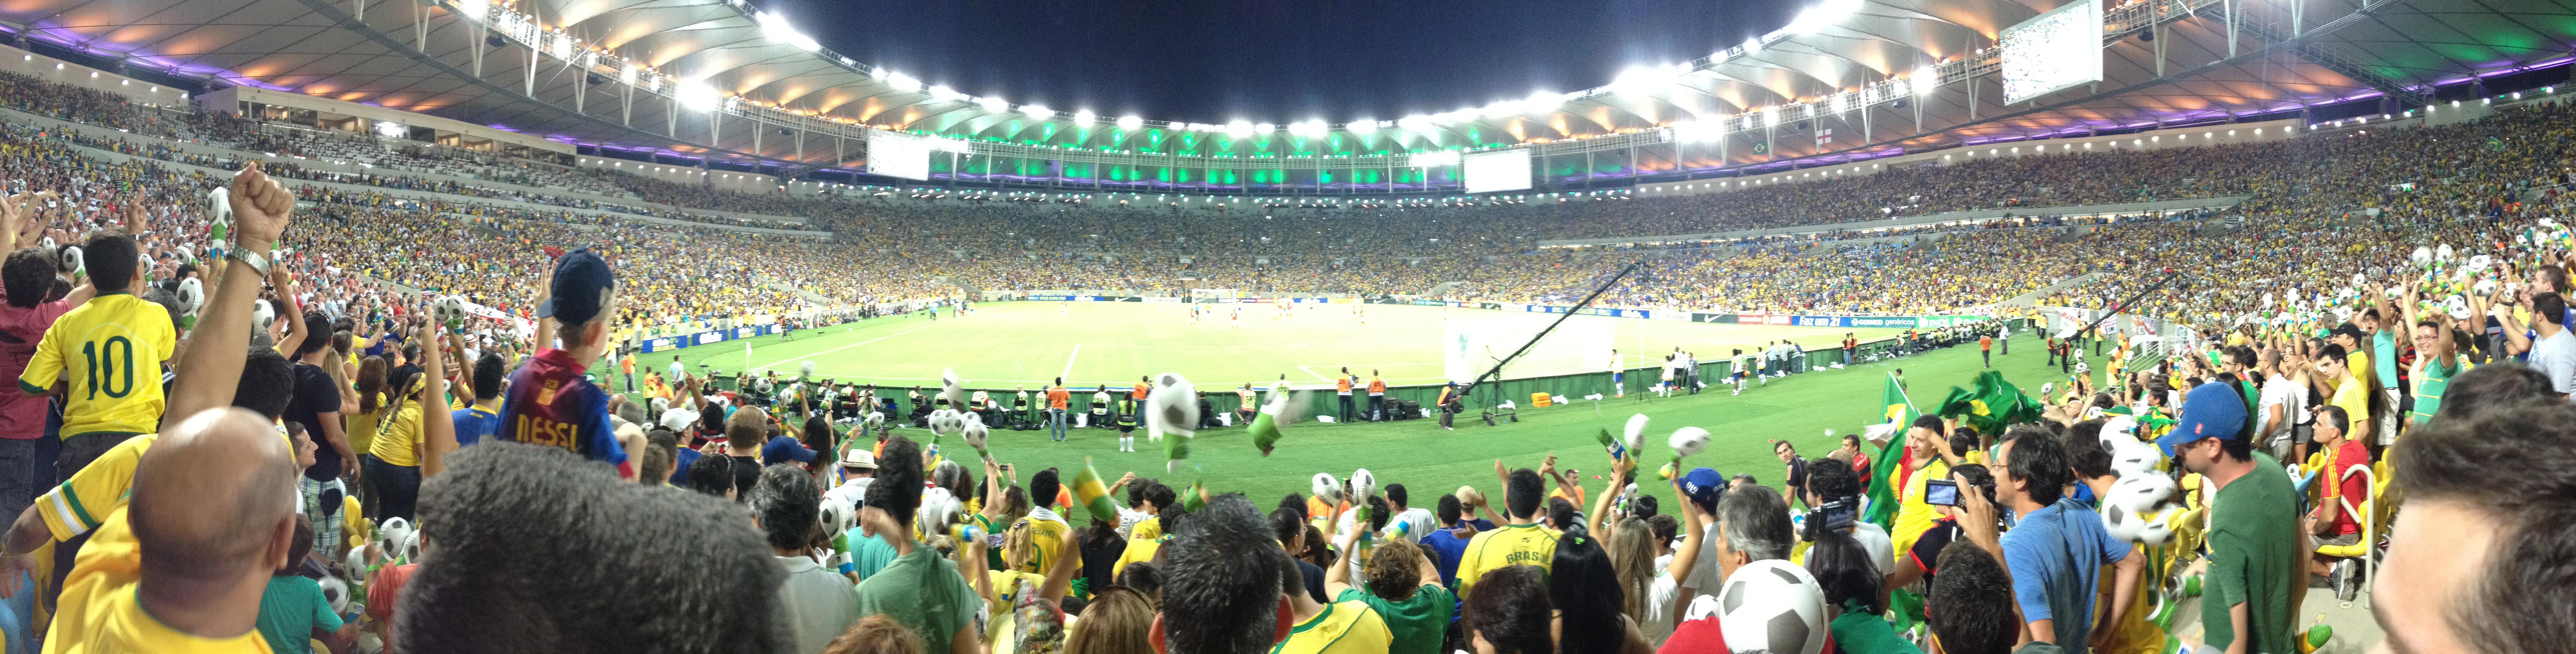 England_v_Brazil_in_Rio_-_Est%C3%A1dio_d